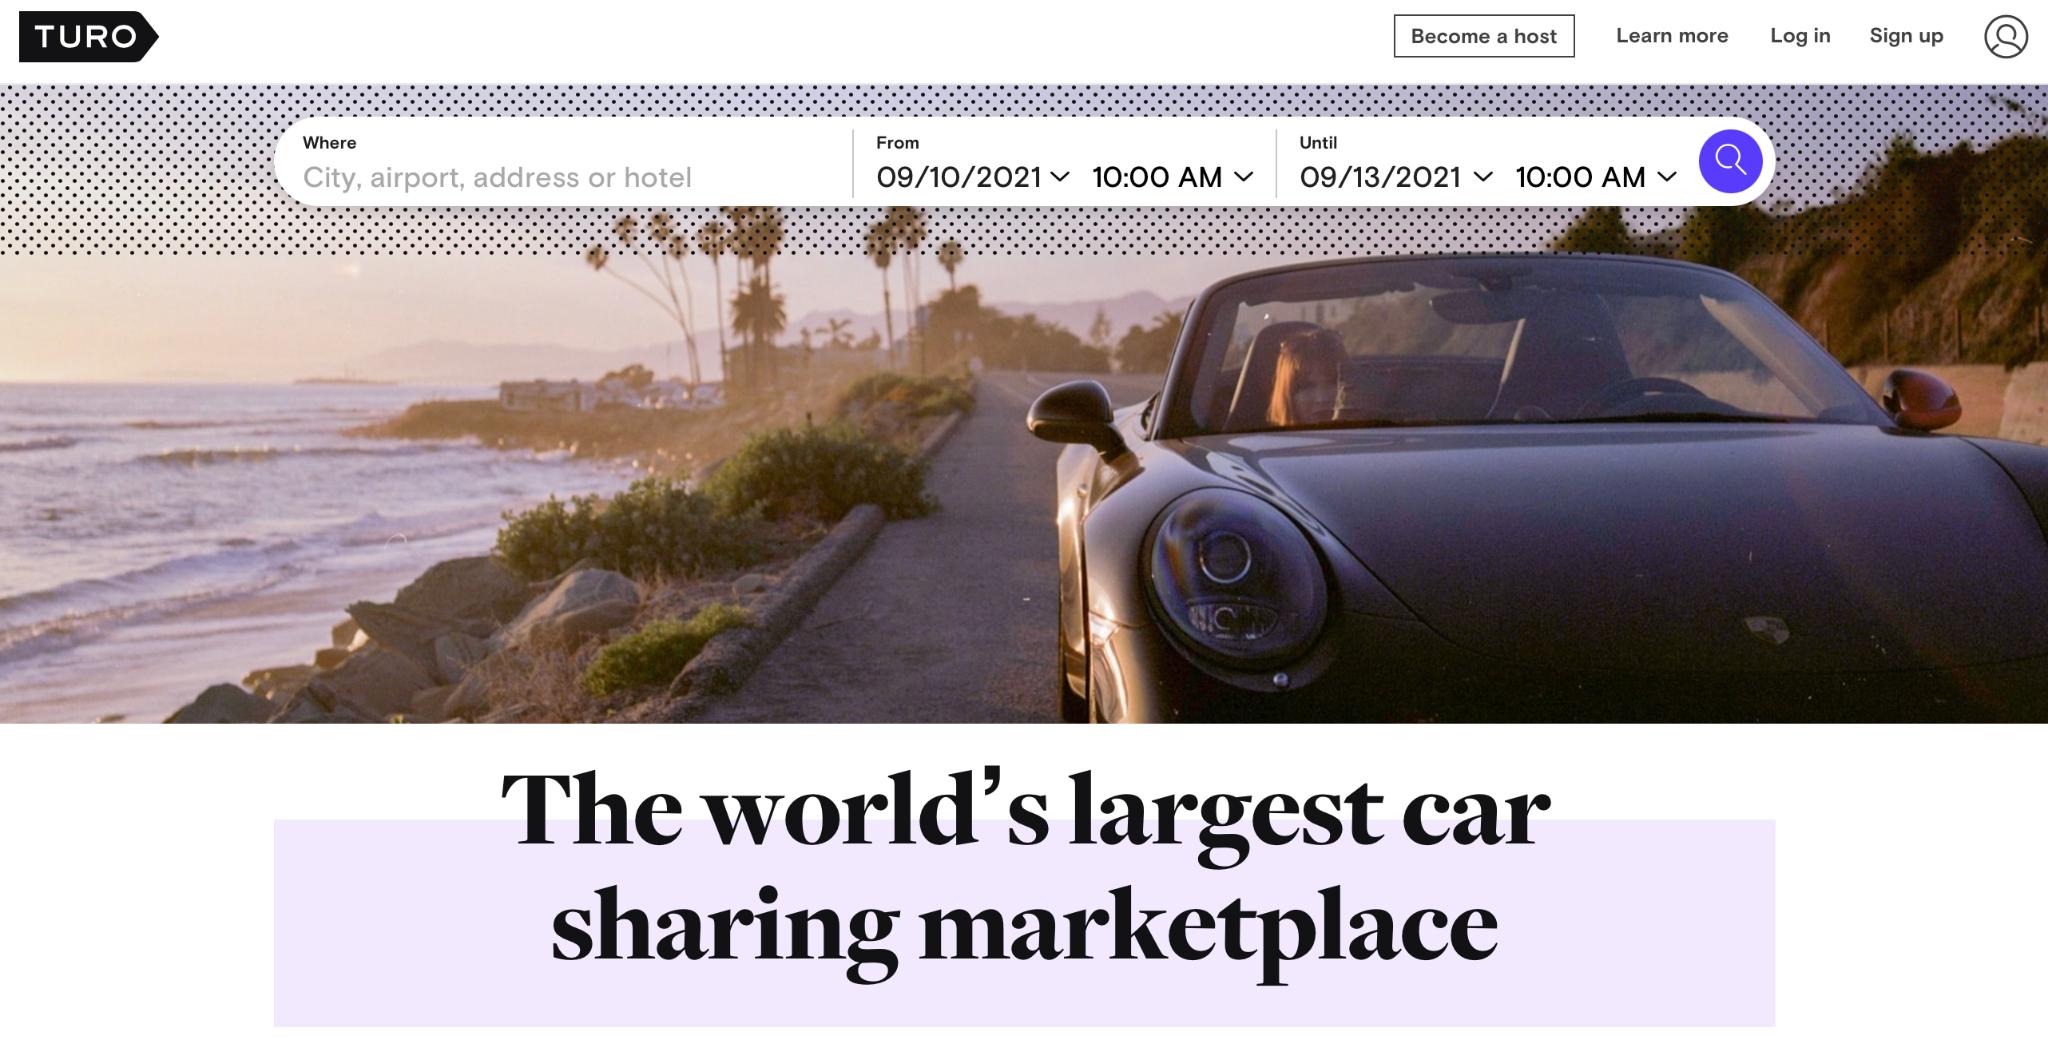 Turo for car-sharing wedding car